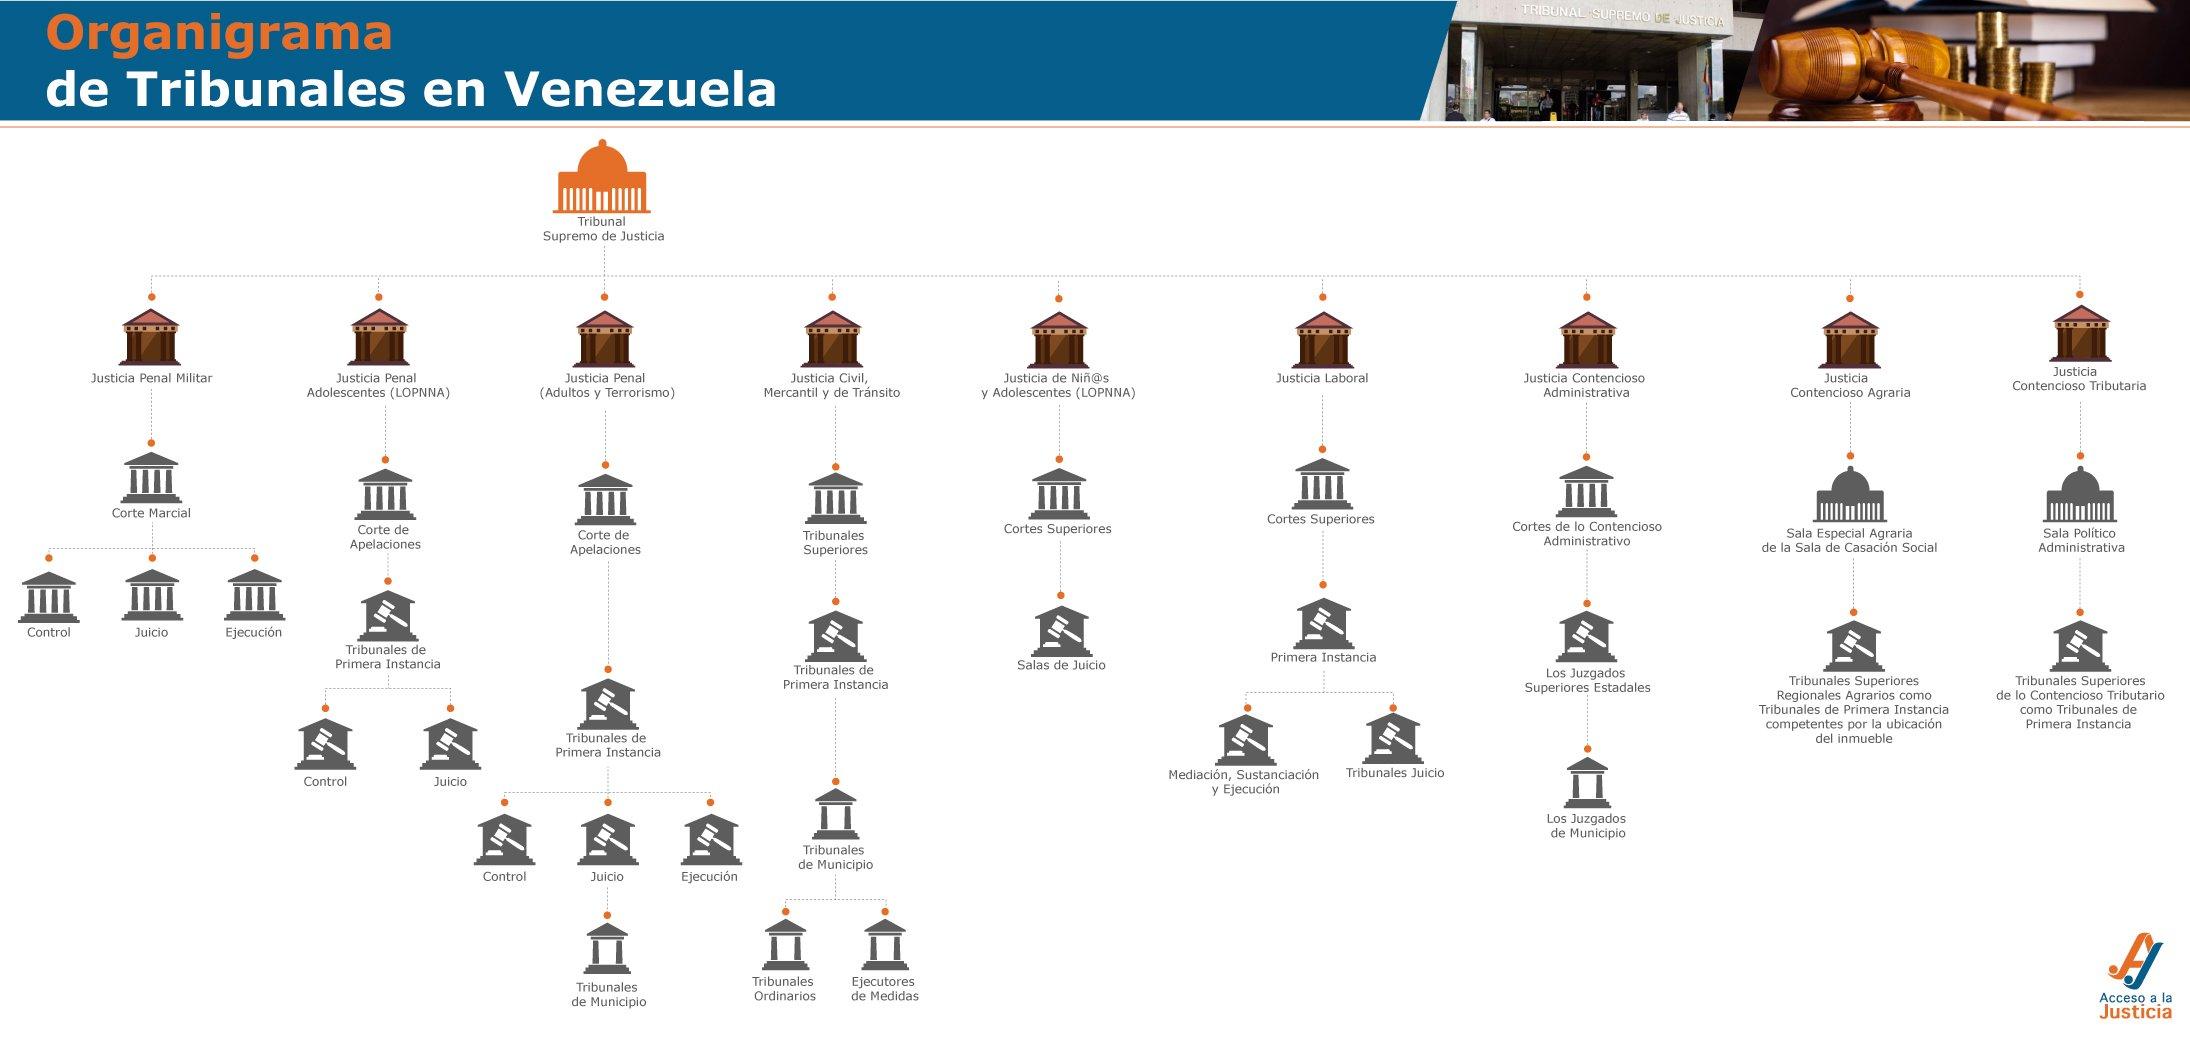 Organigrama-tribunales-en-venezuela